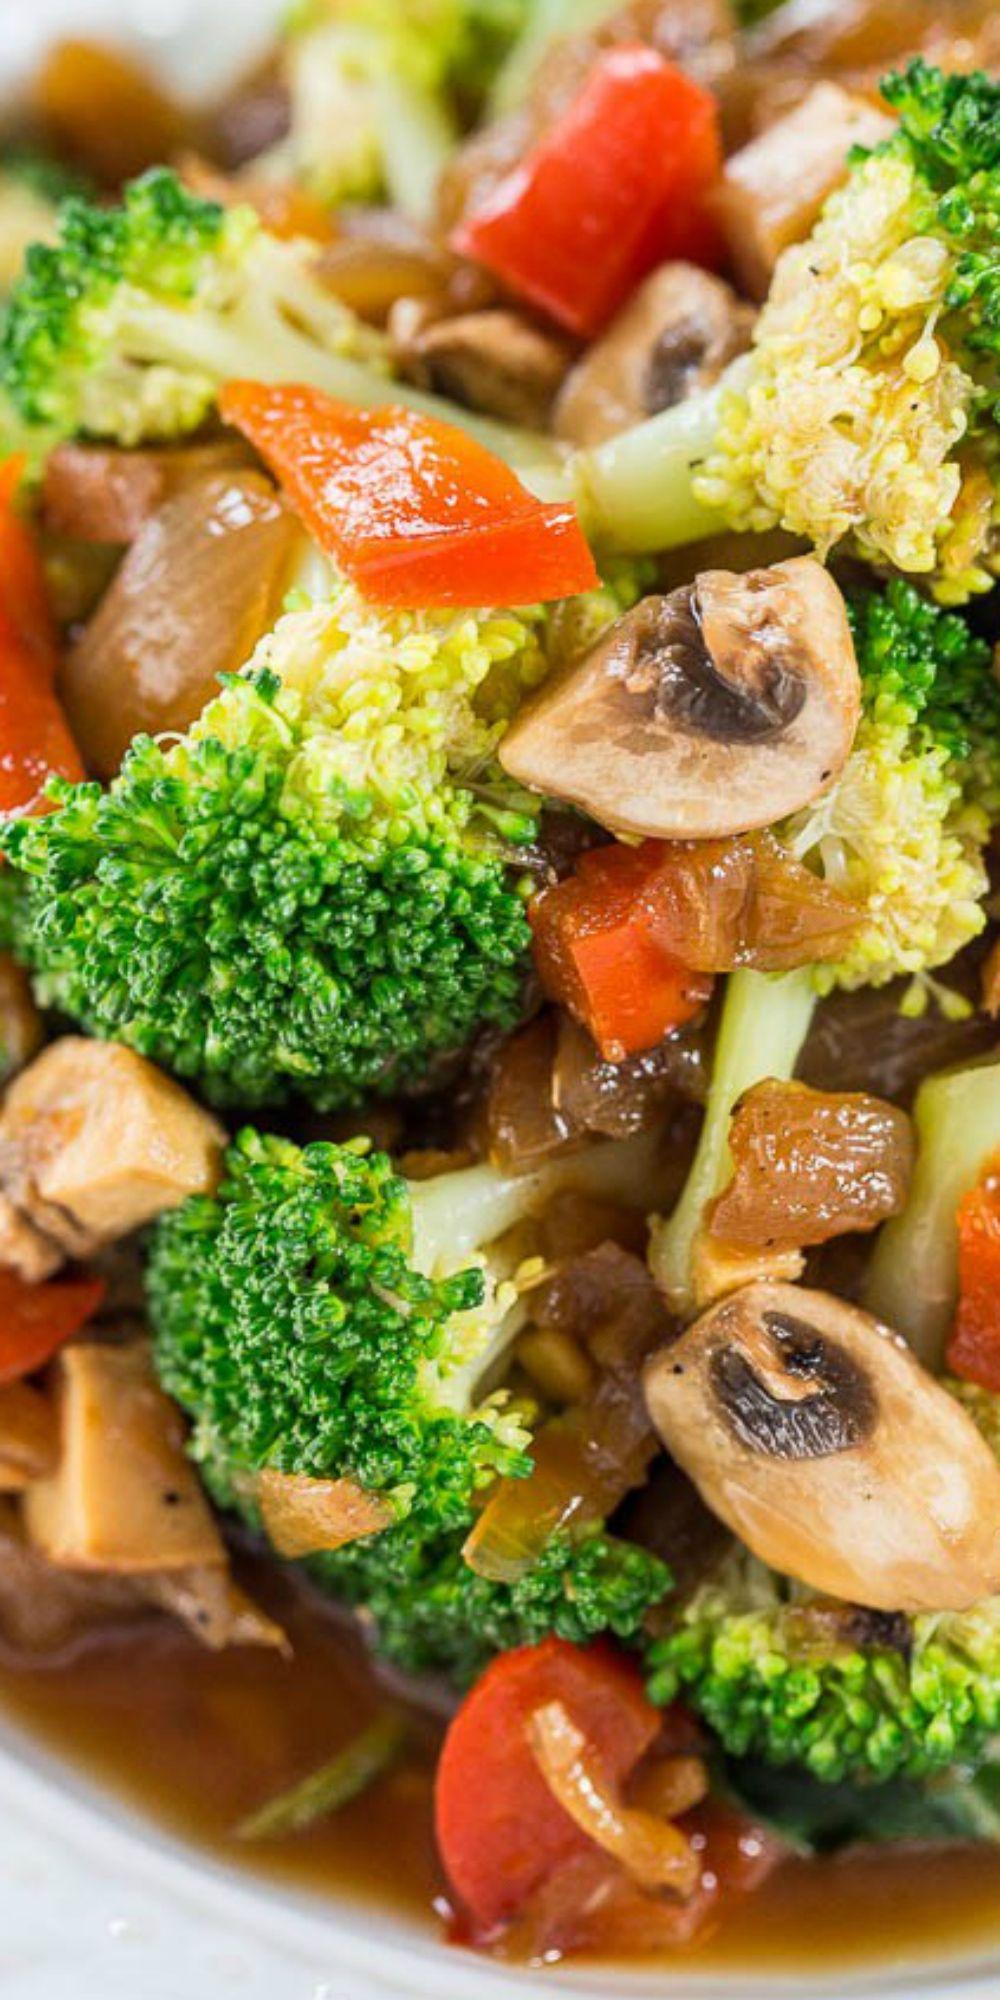 Healthy Vegetable Stir Fry Recipe Best Stir Fry Veggies Averie Cooks Recipe Mix Vegetable Recipe Veggie Fries Vegetable Stir Fry Recipe